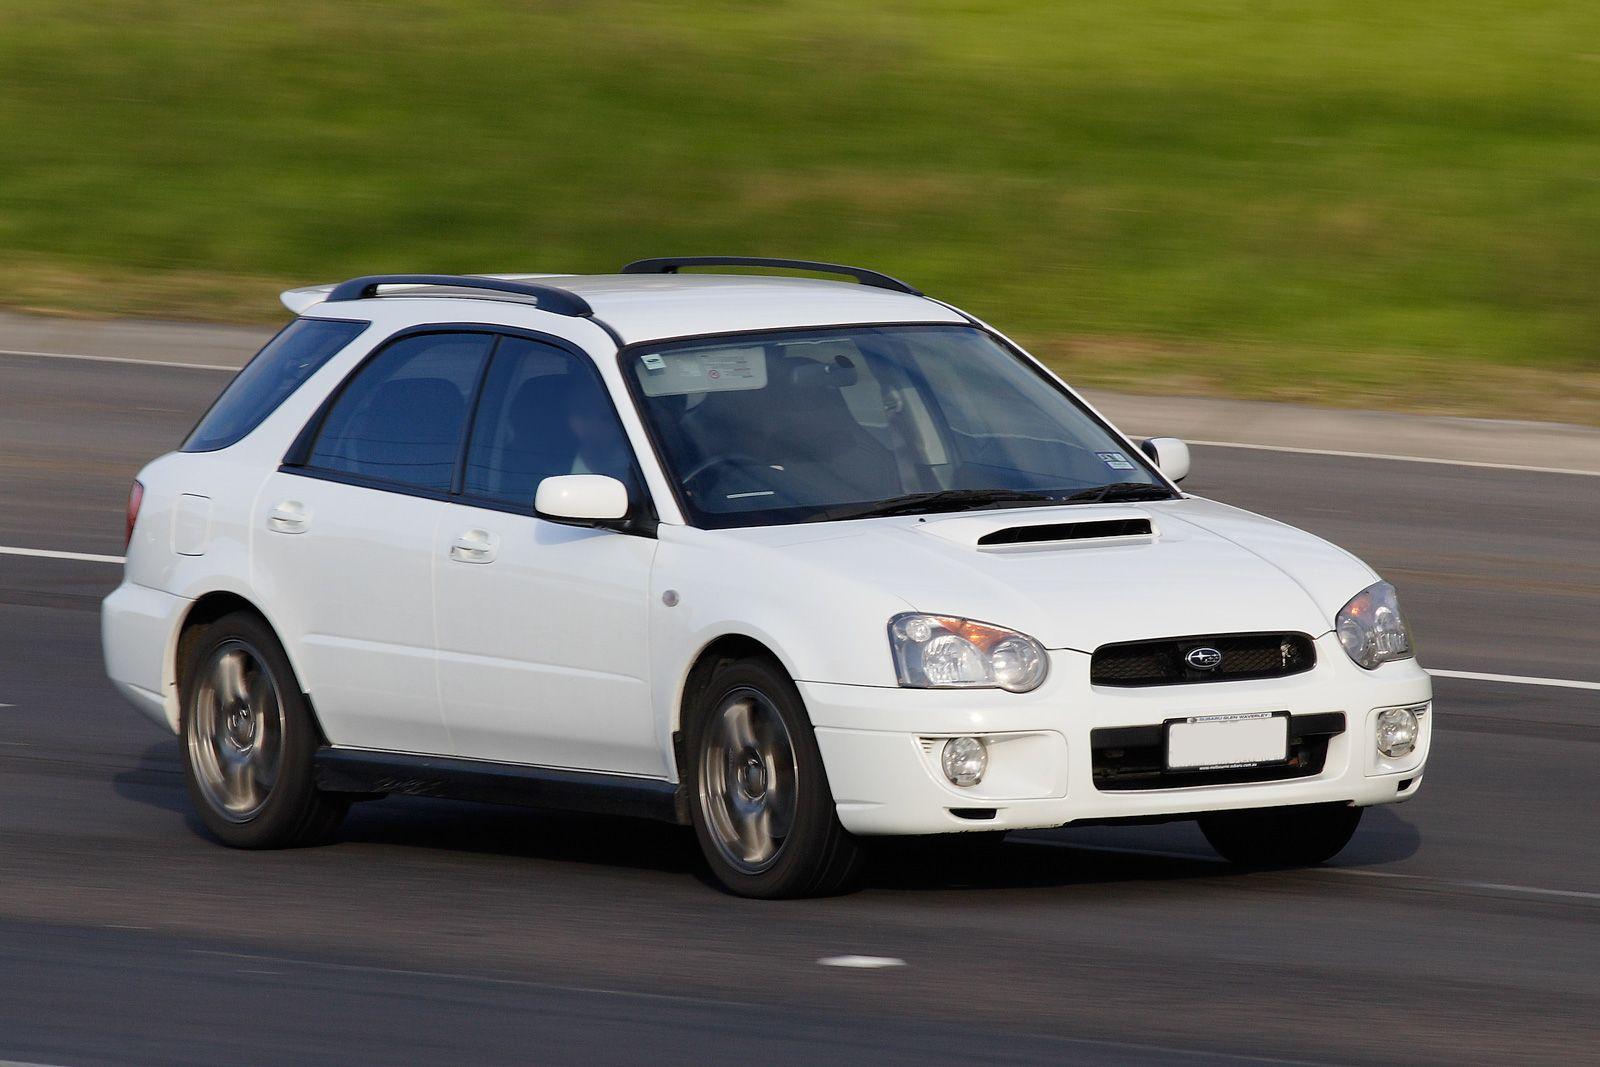 Description 2002u20132005 Subaru Impreza WRX Hatchback